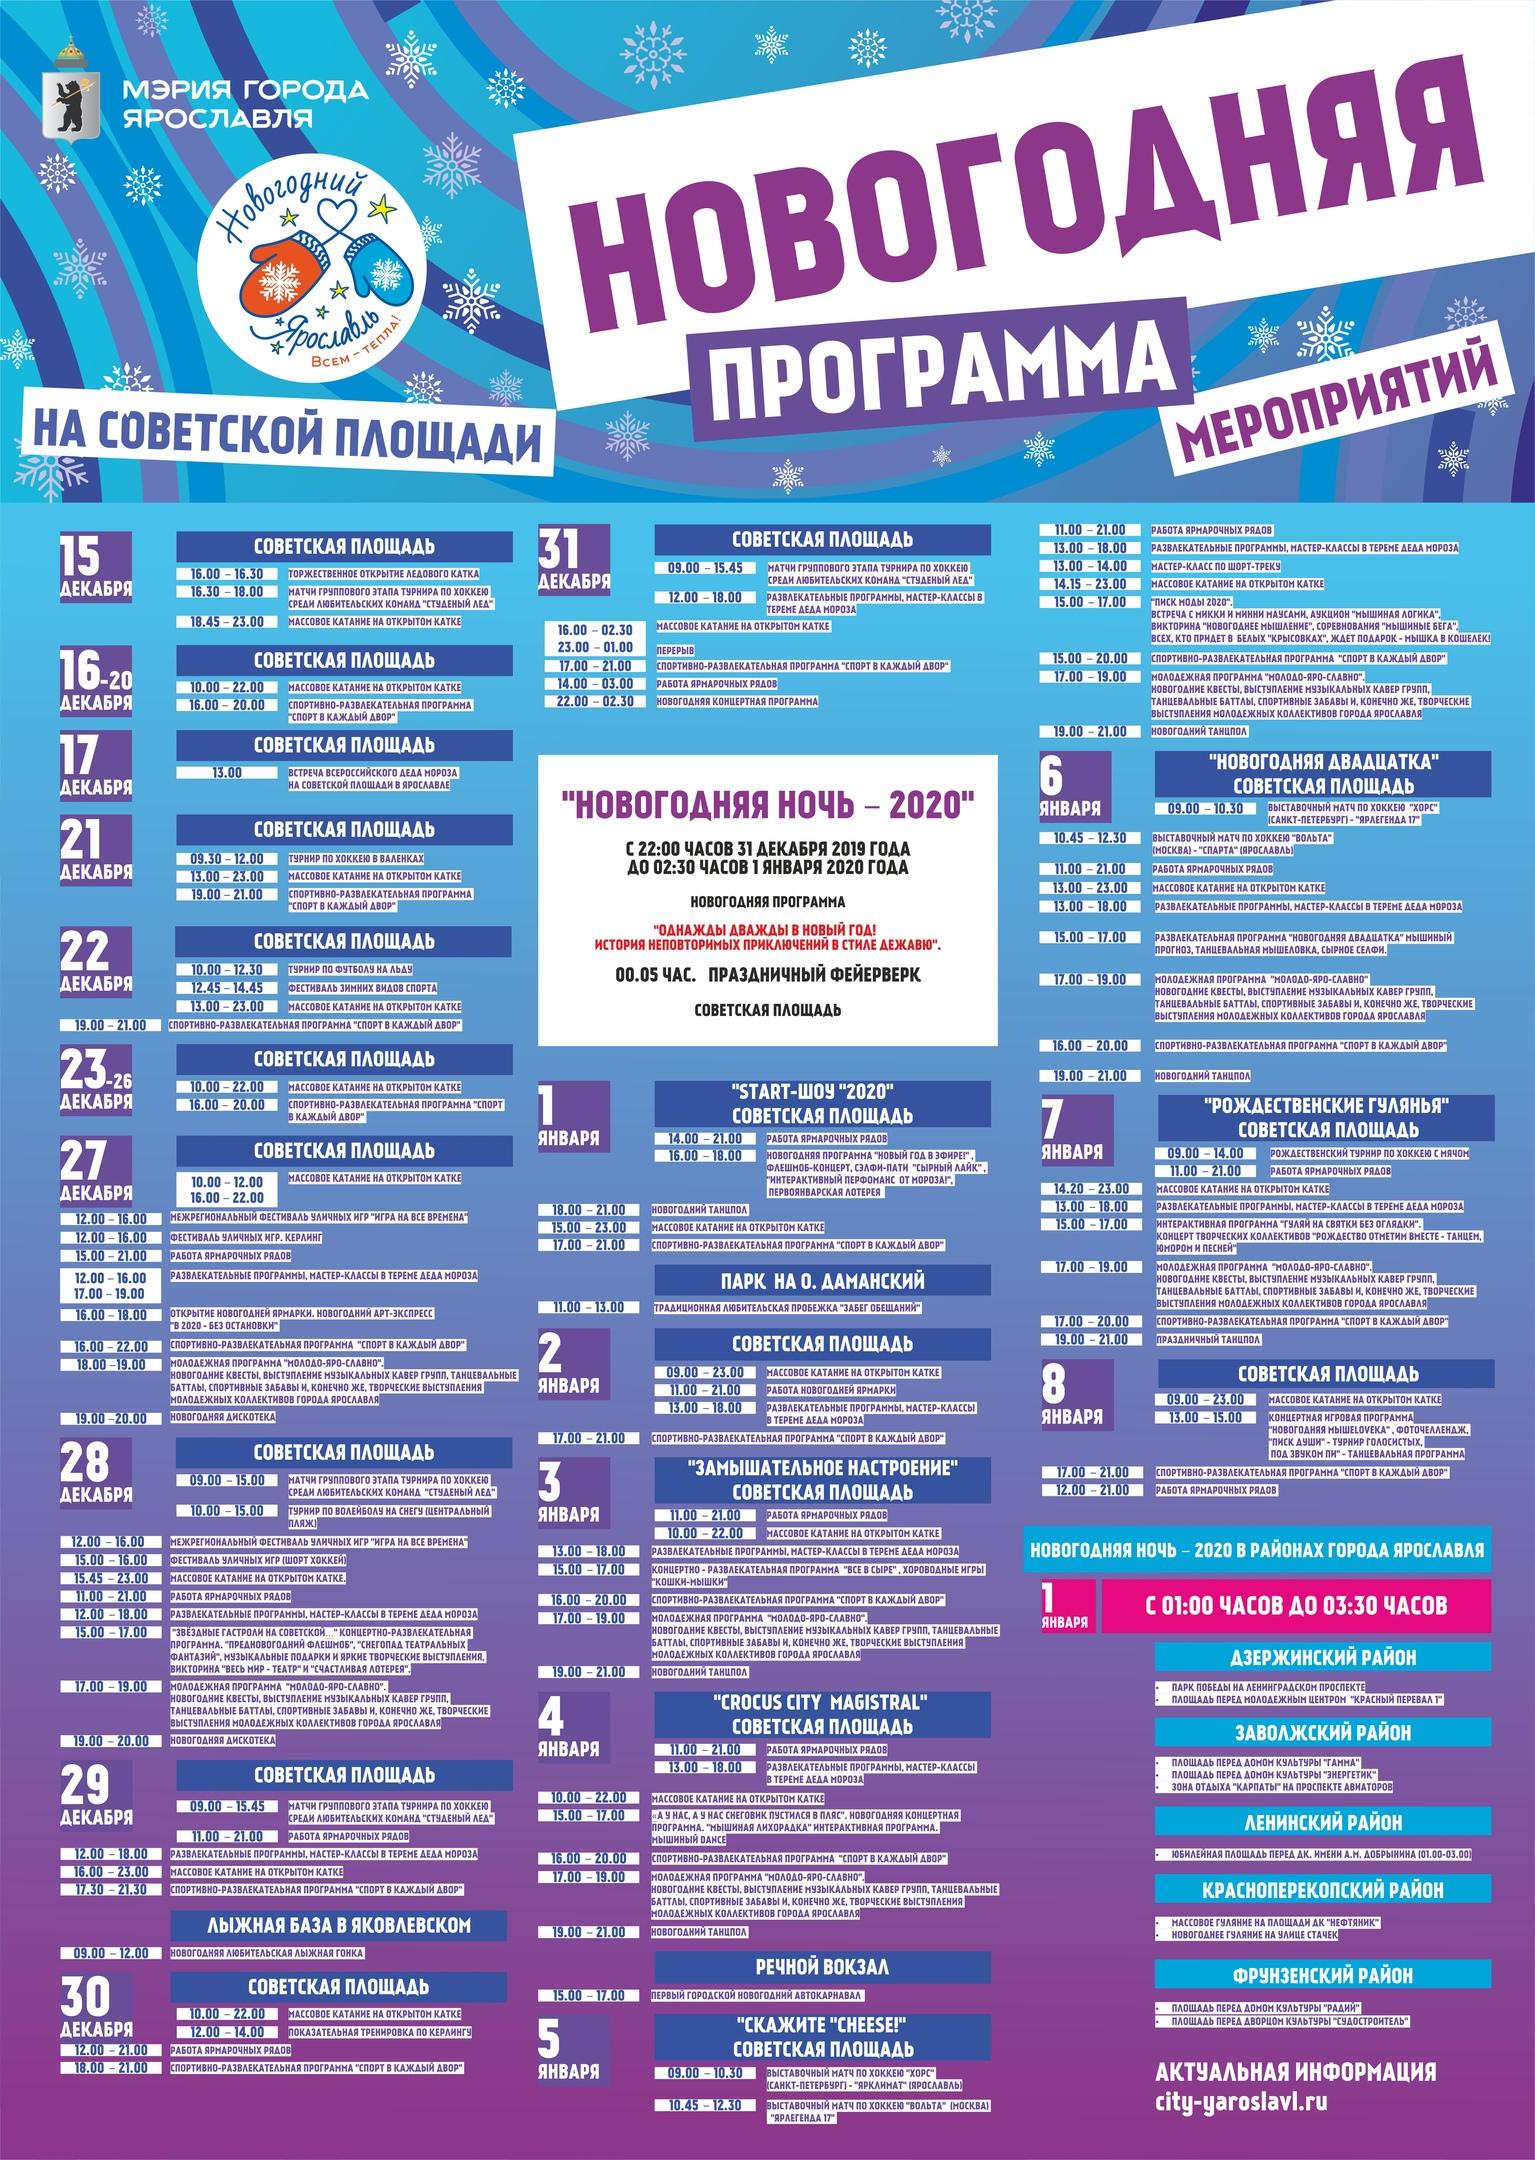 Новогодняя программа в Ярославле 2020